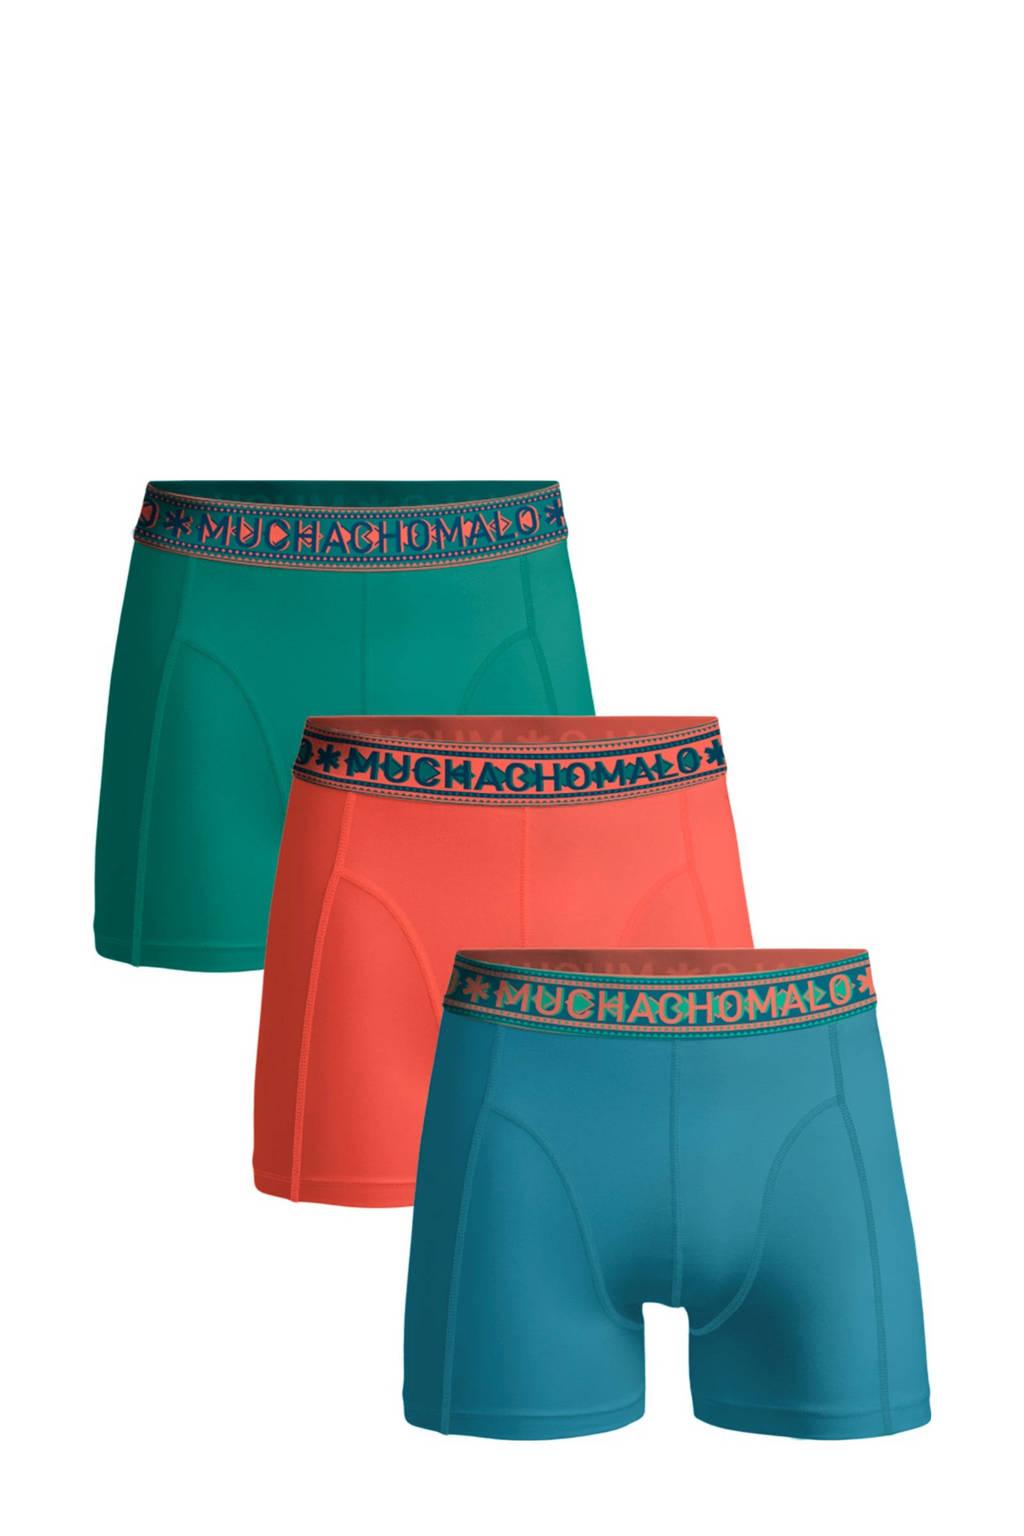 Muchachomalo   boxershort Solid - set van 3 blauw/koraalrood/groen, Blauw/koraalrood/groen